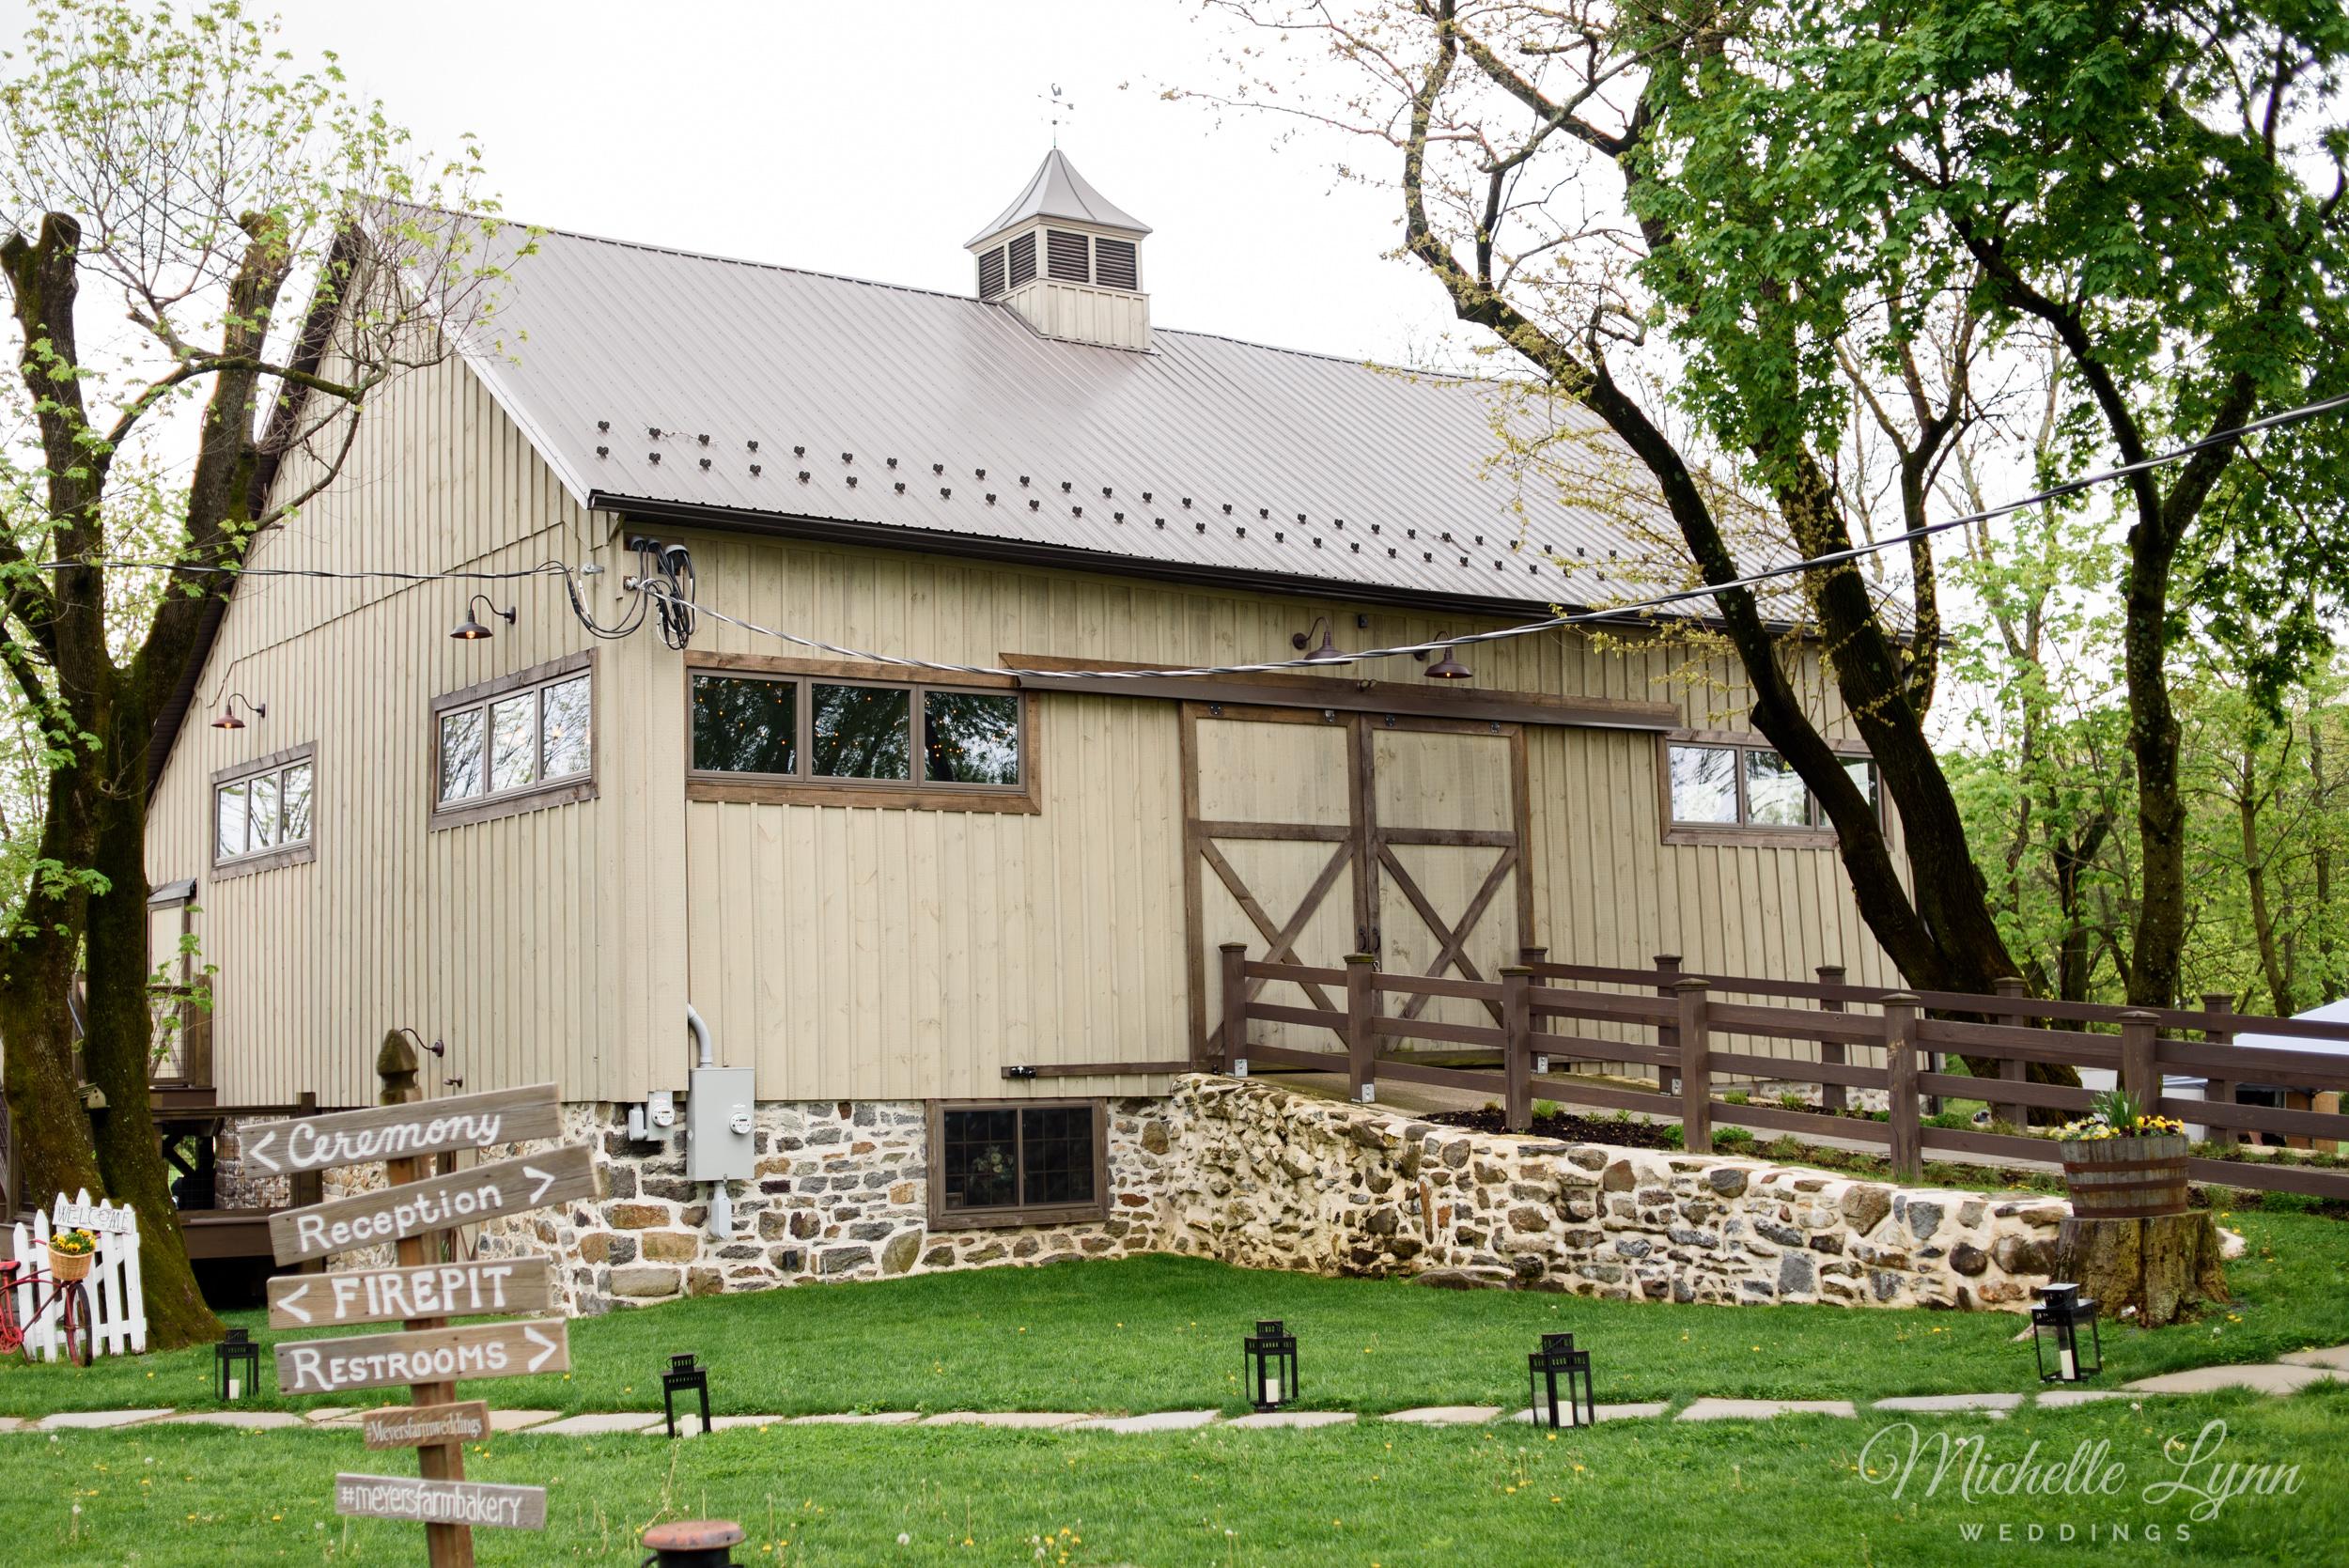 mlw-the-farm-bakery-and-events-wedding-photos-16.jpg